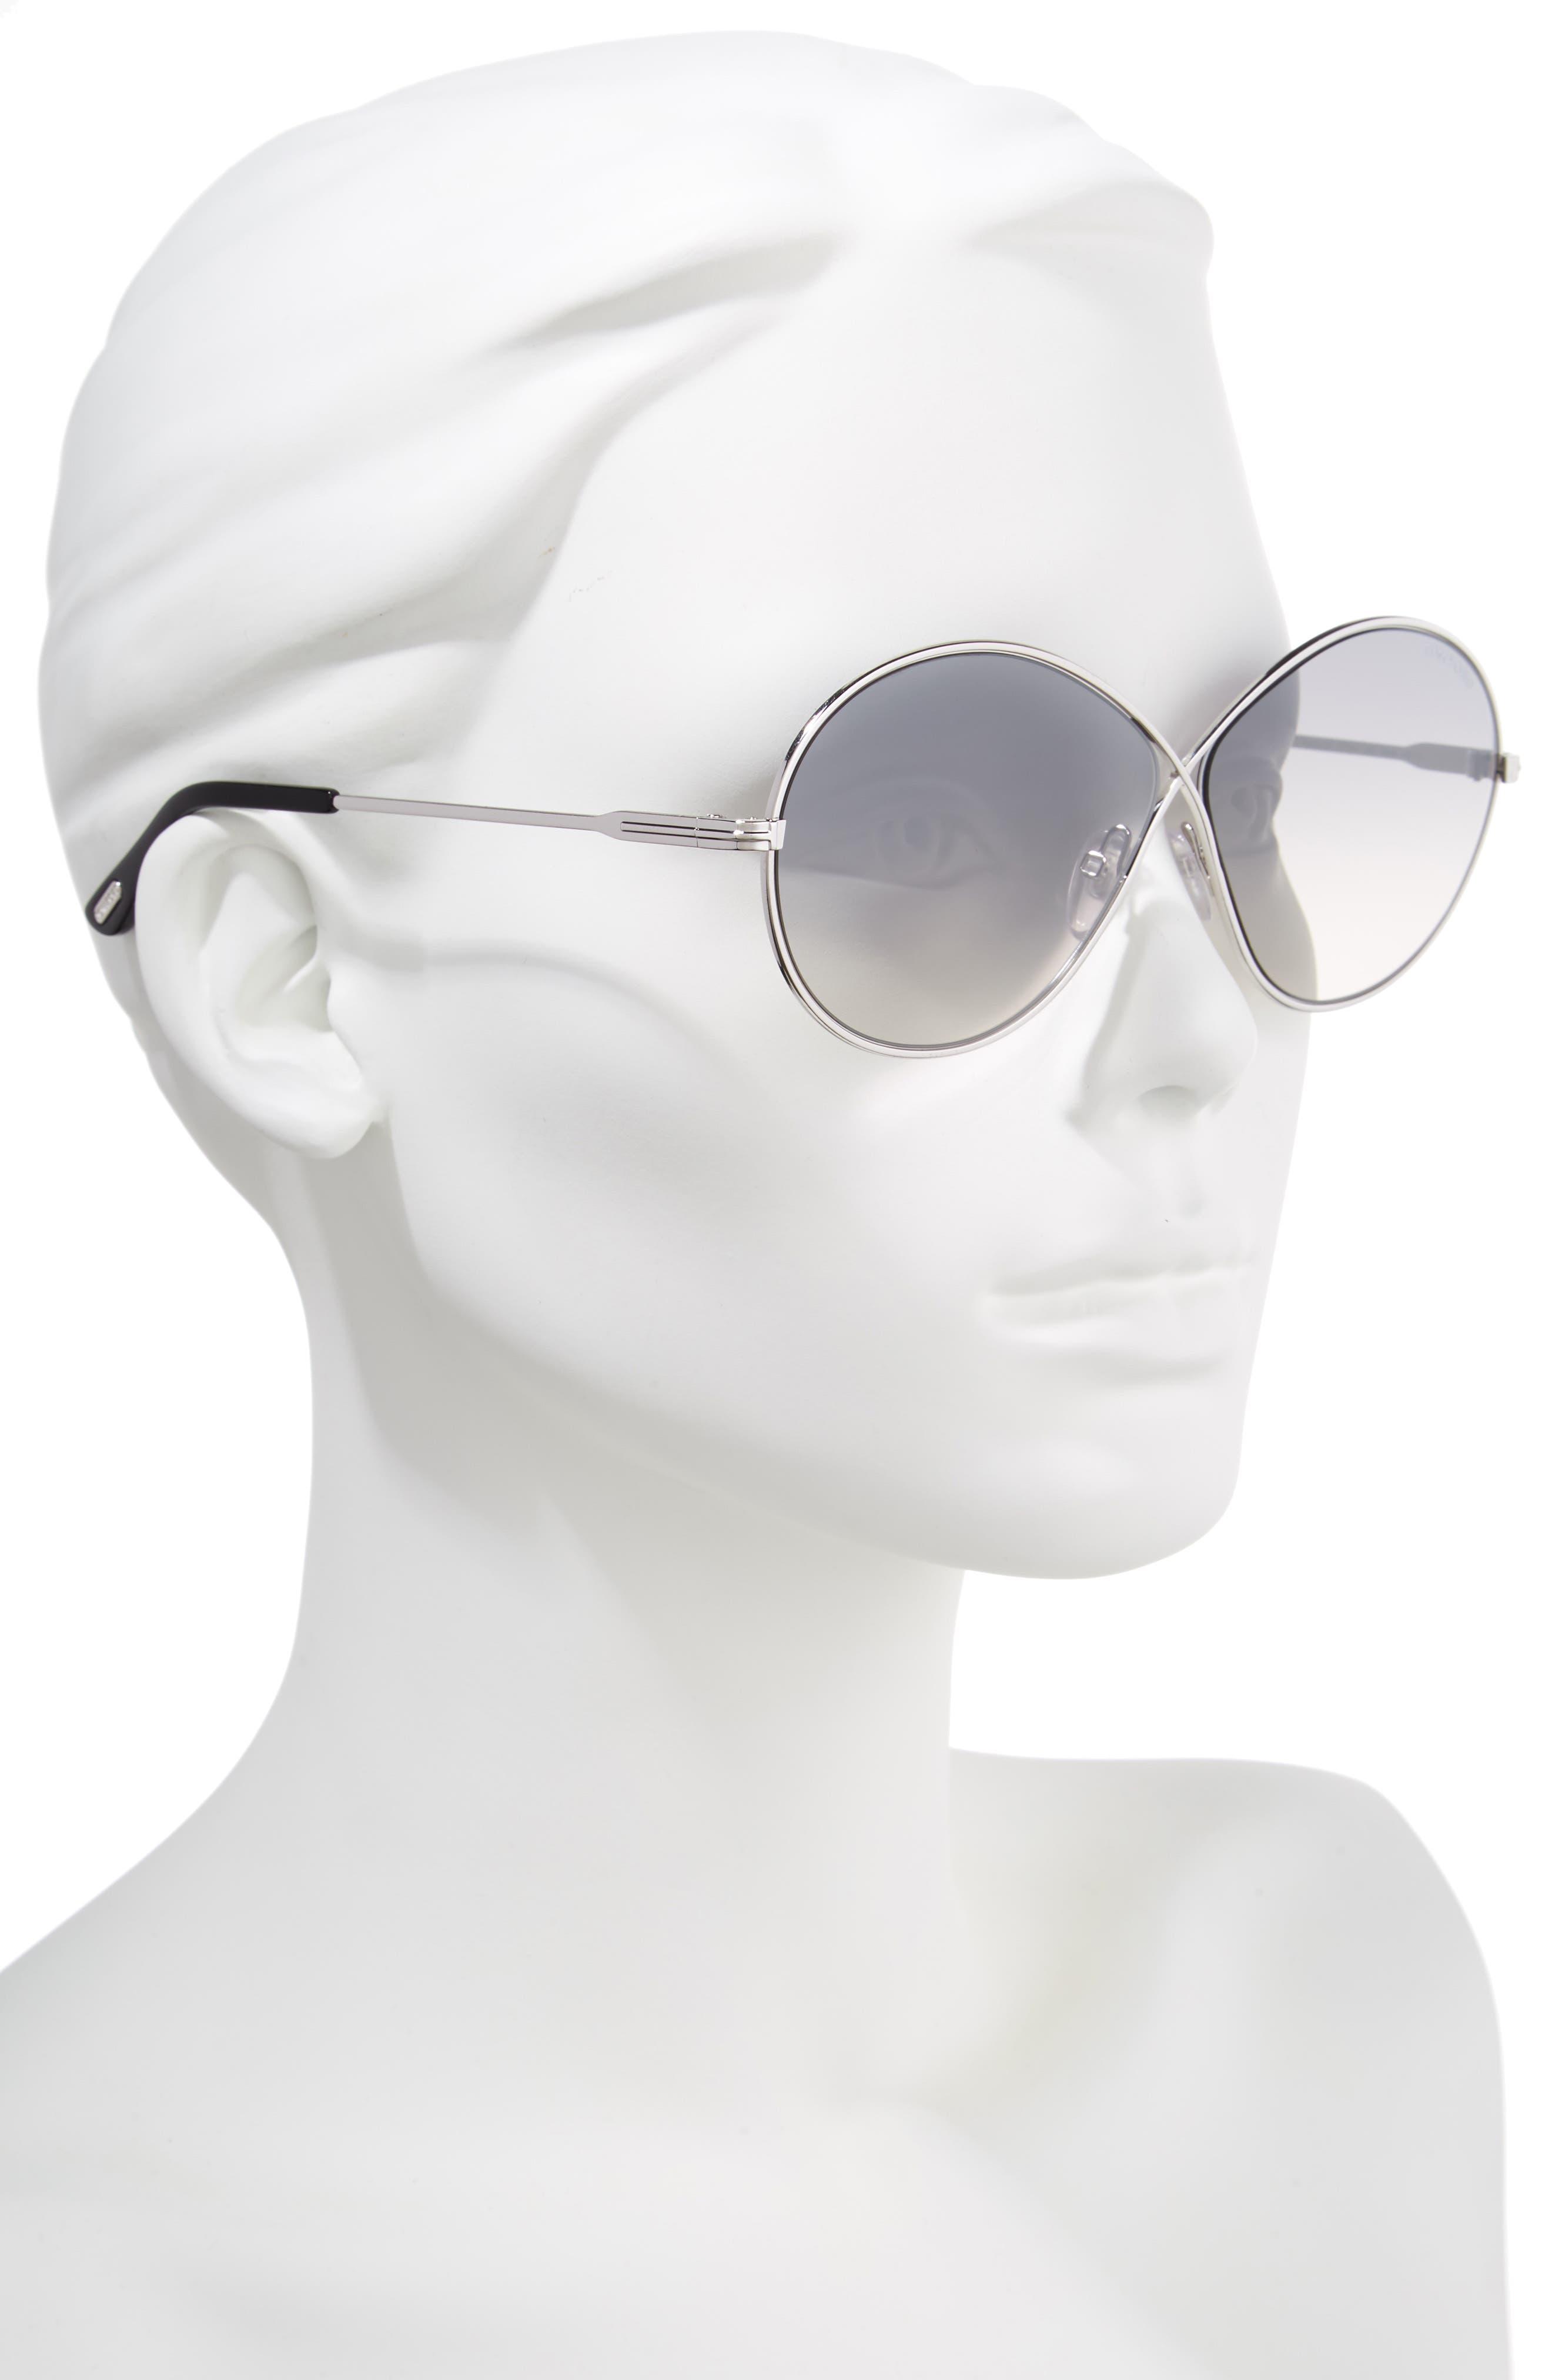 Rania 64mm Oversize Round Sunglasses,                             Alternate thumbnail 2, color,                             040